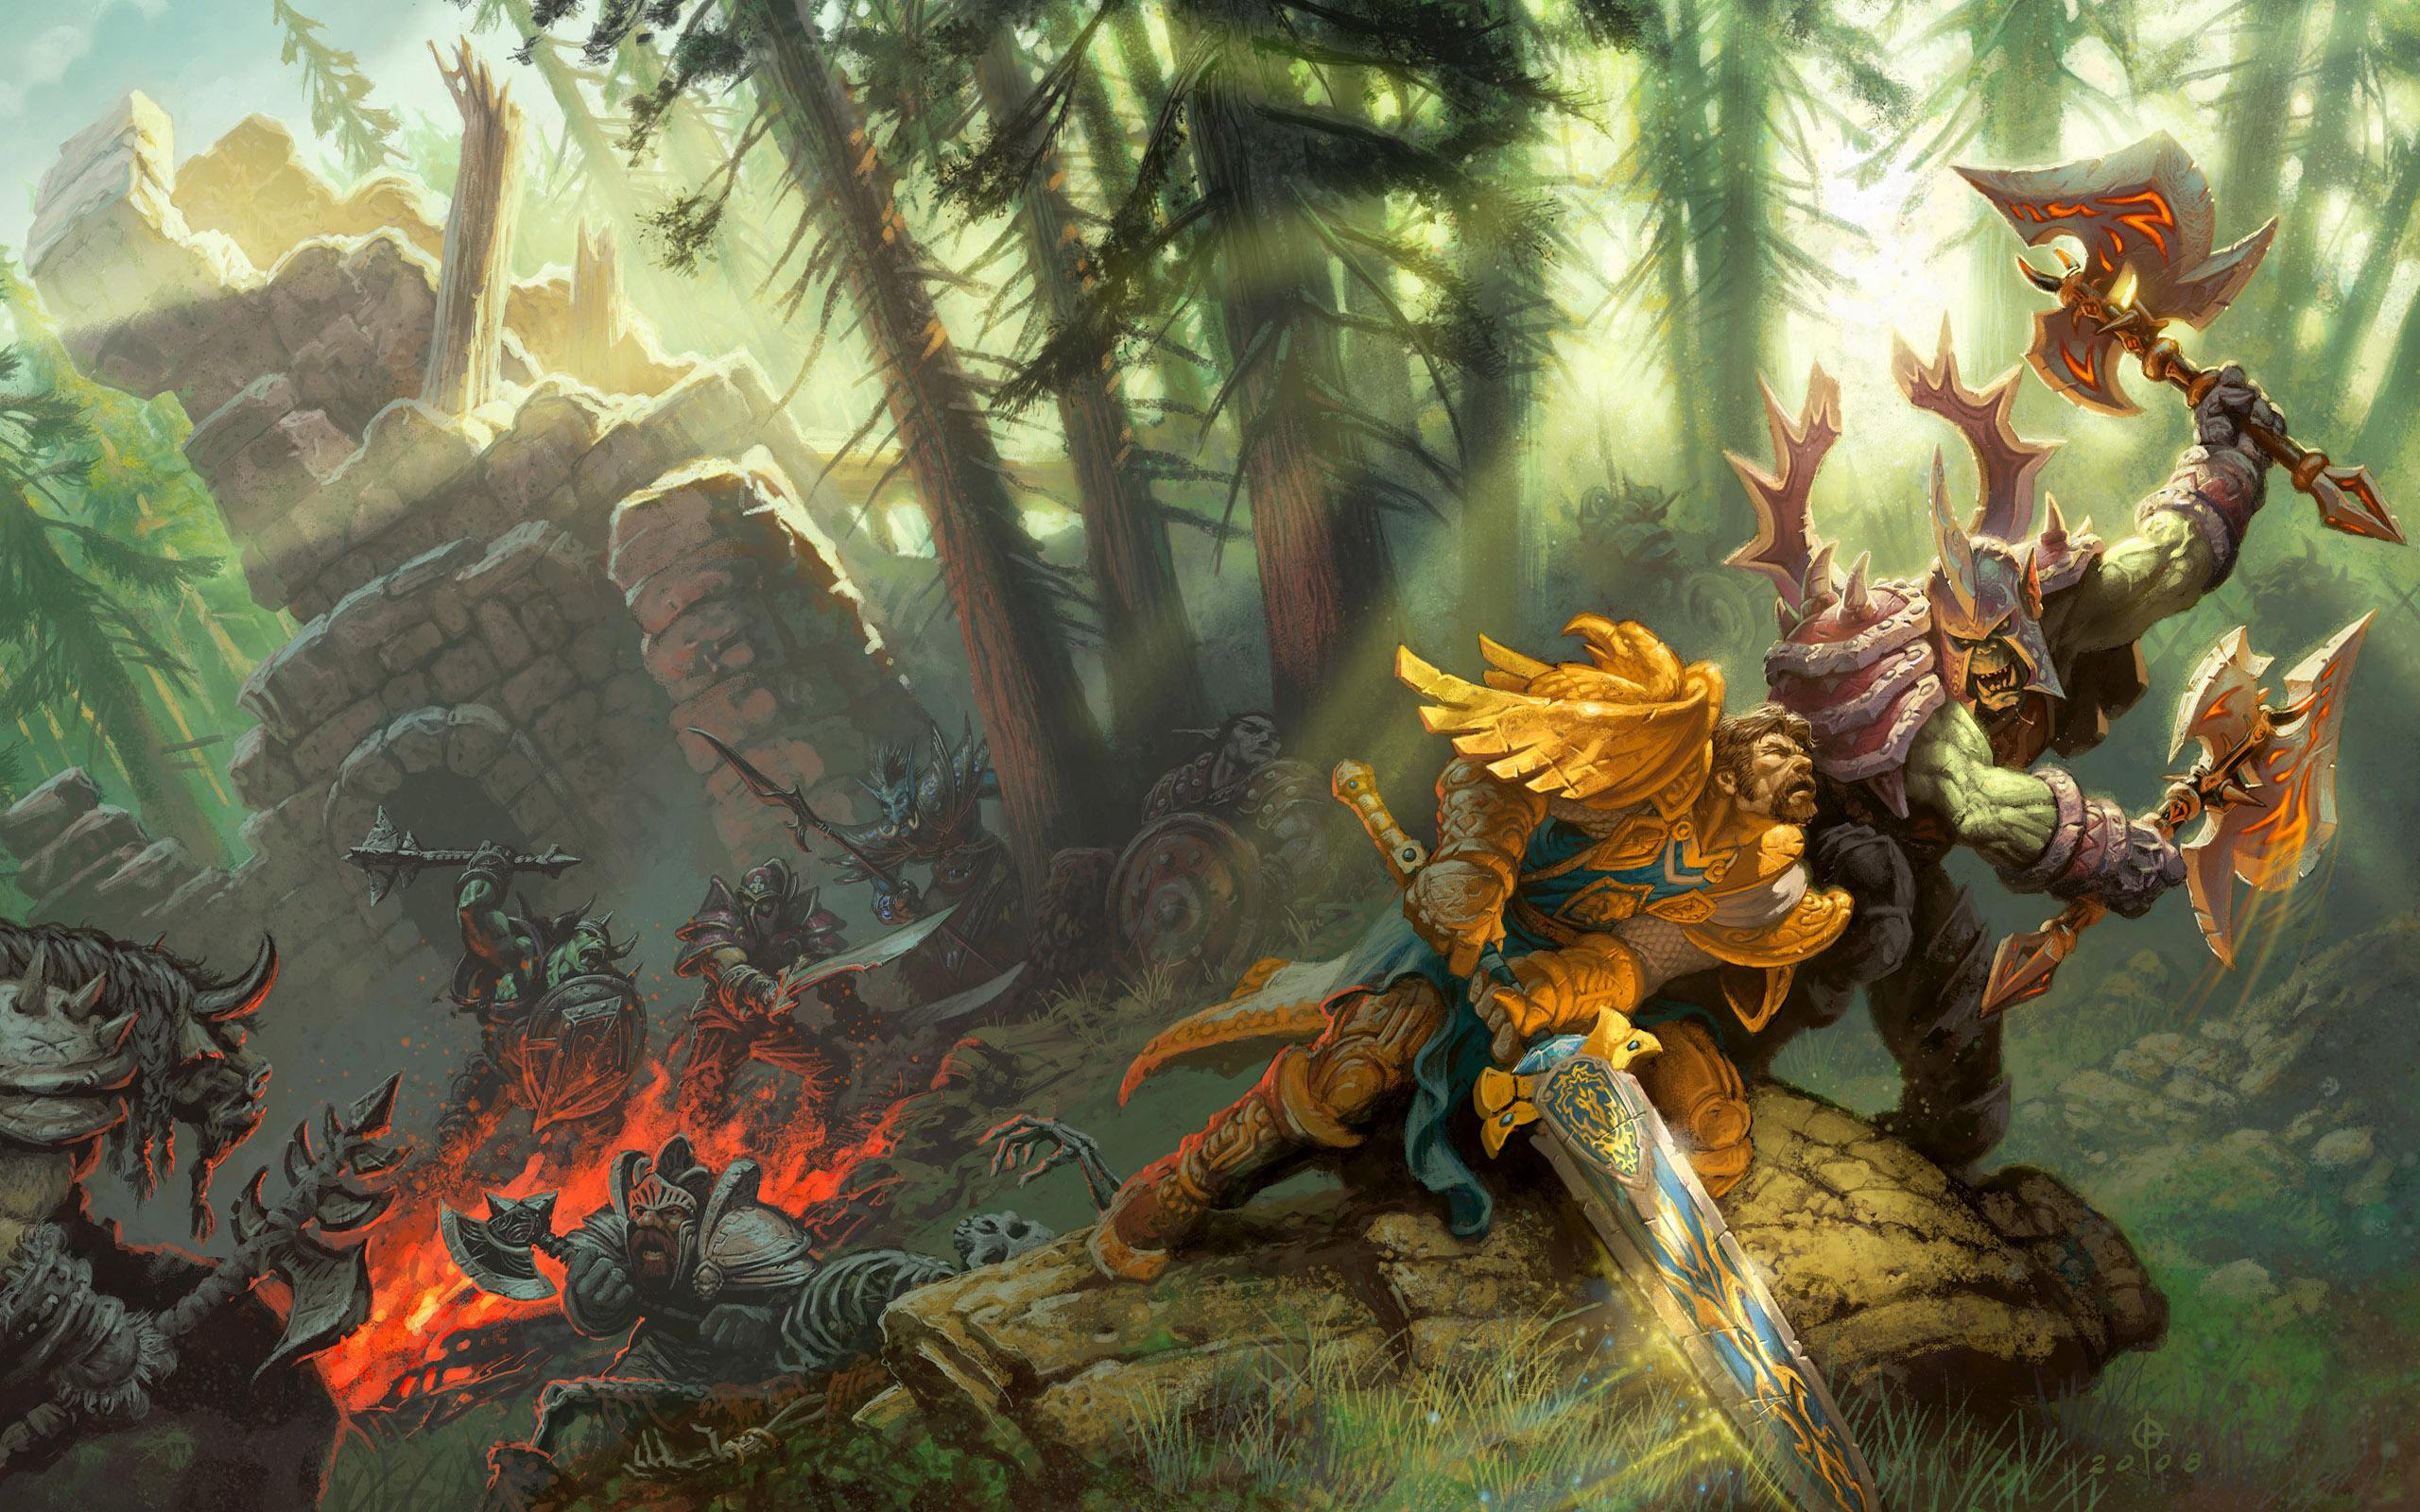 World Of Warcraft Wallpaper Hd 2560x1600